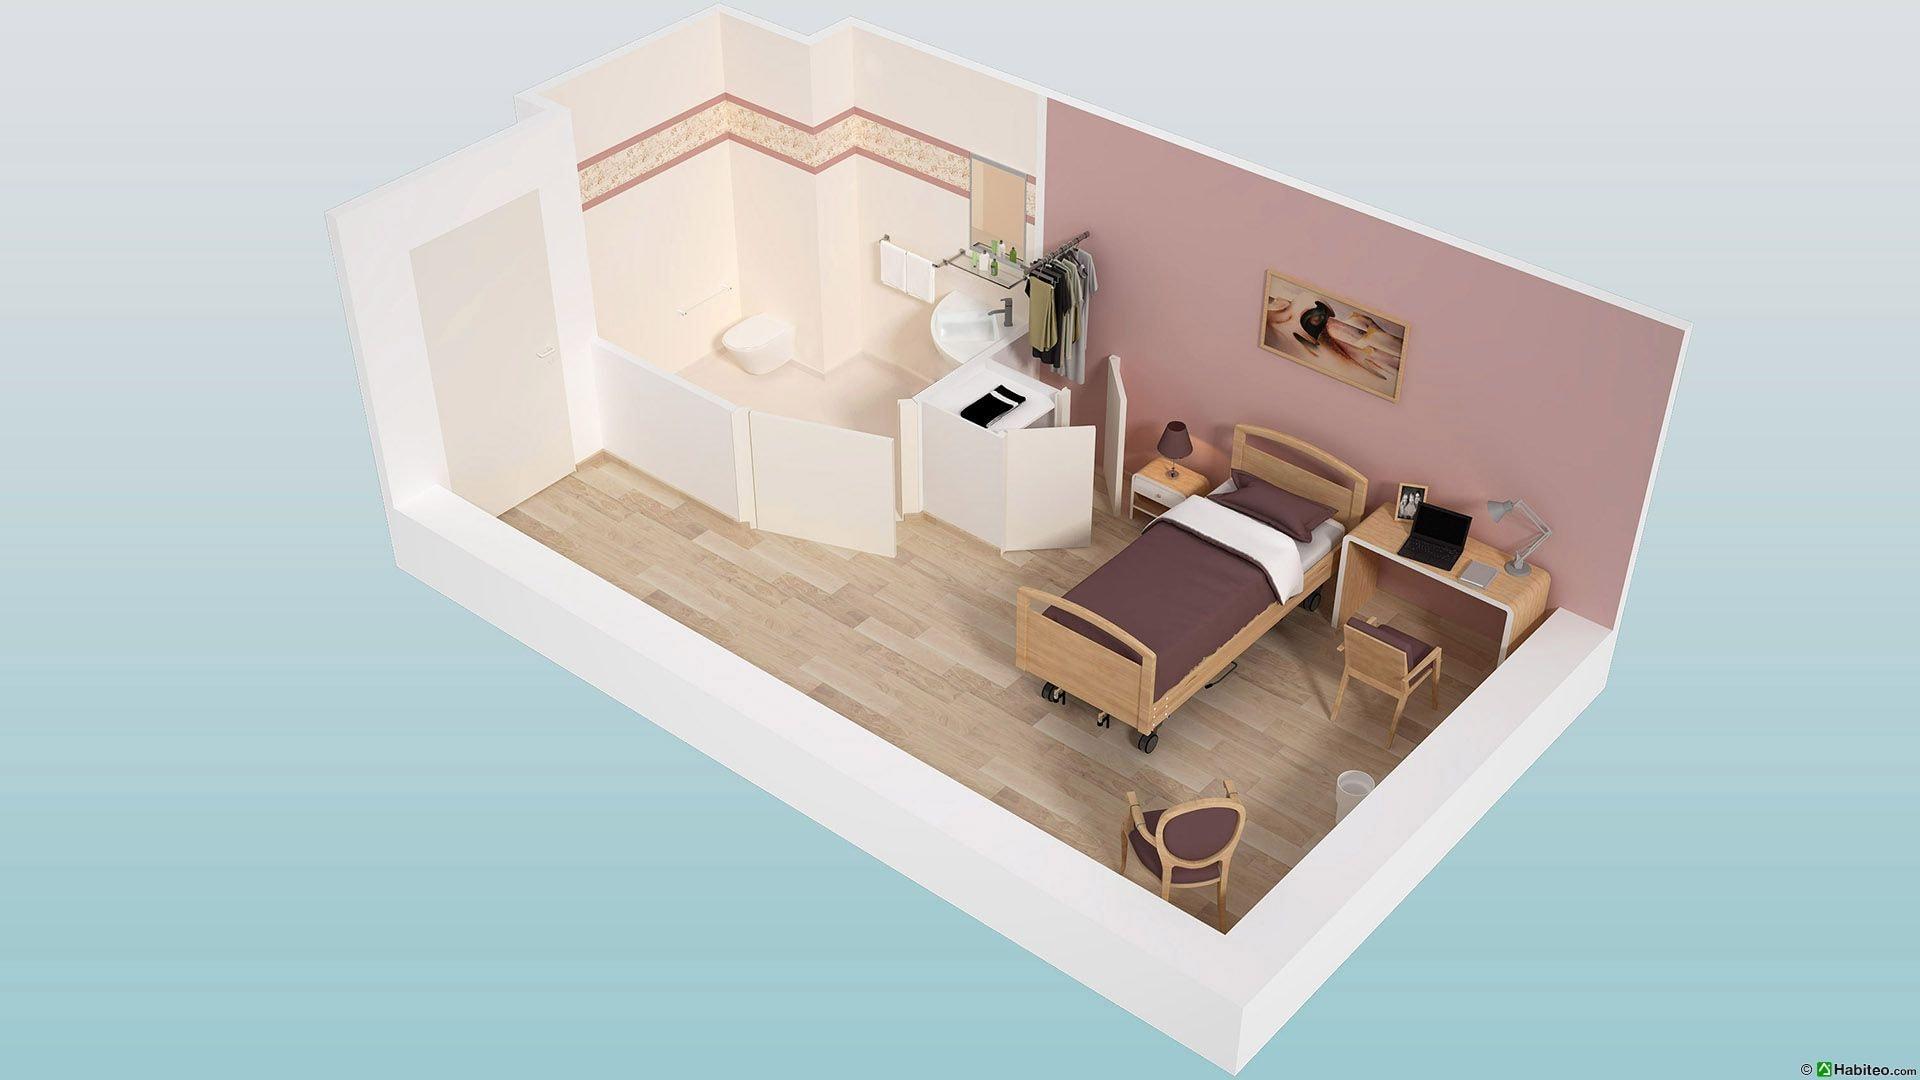 Acheter chambre maison retraite m dicalis e ventana blog - Acheter une chambre en maison de retraite ...